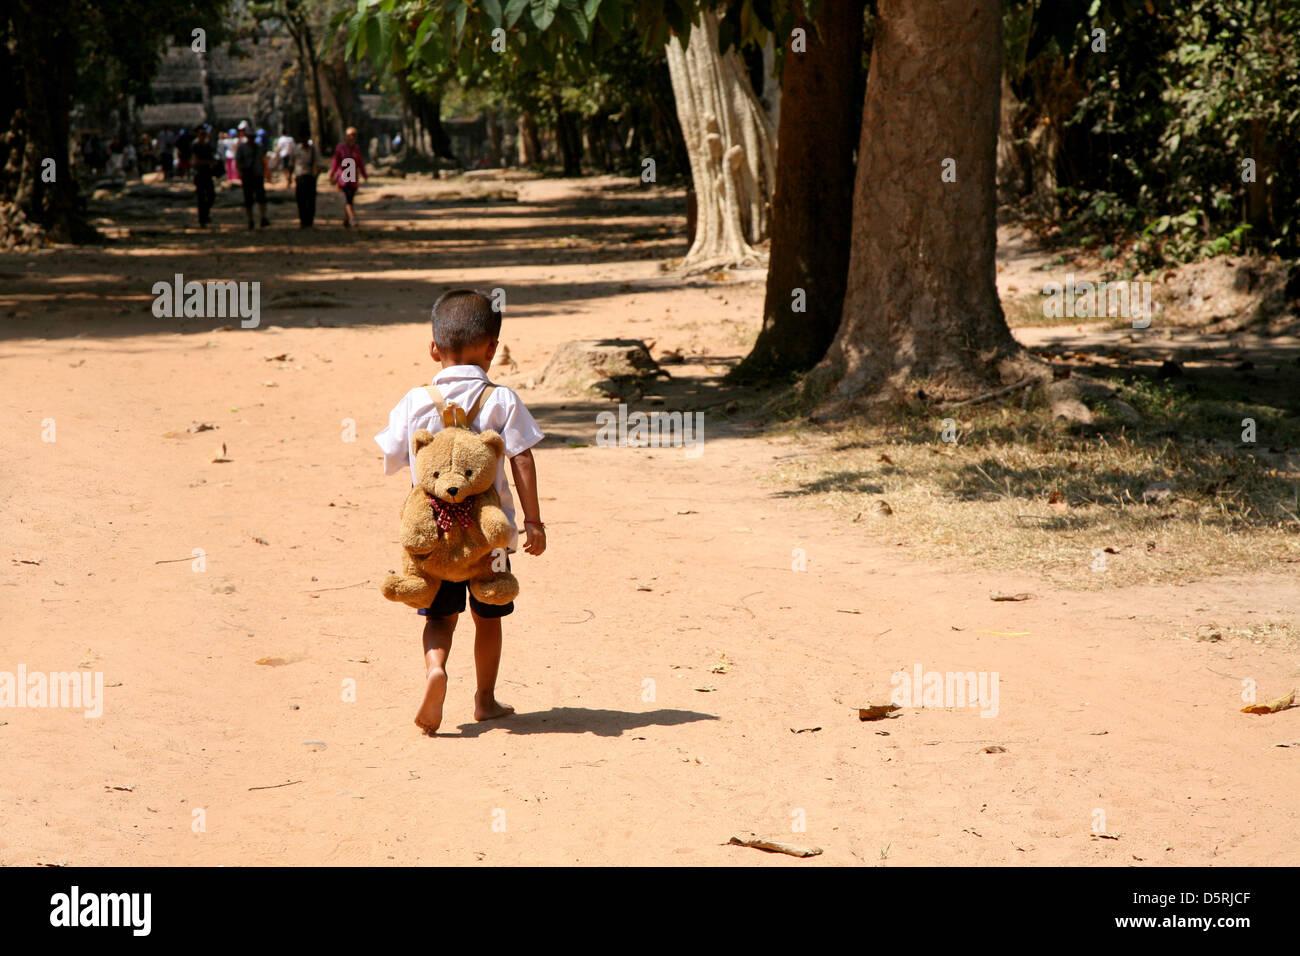 Boy in Cambodia - Stock Image